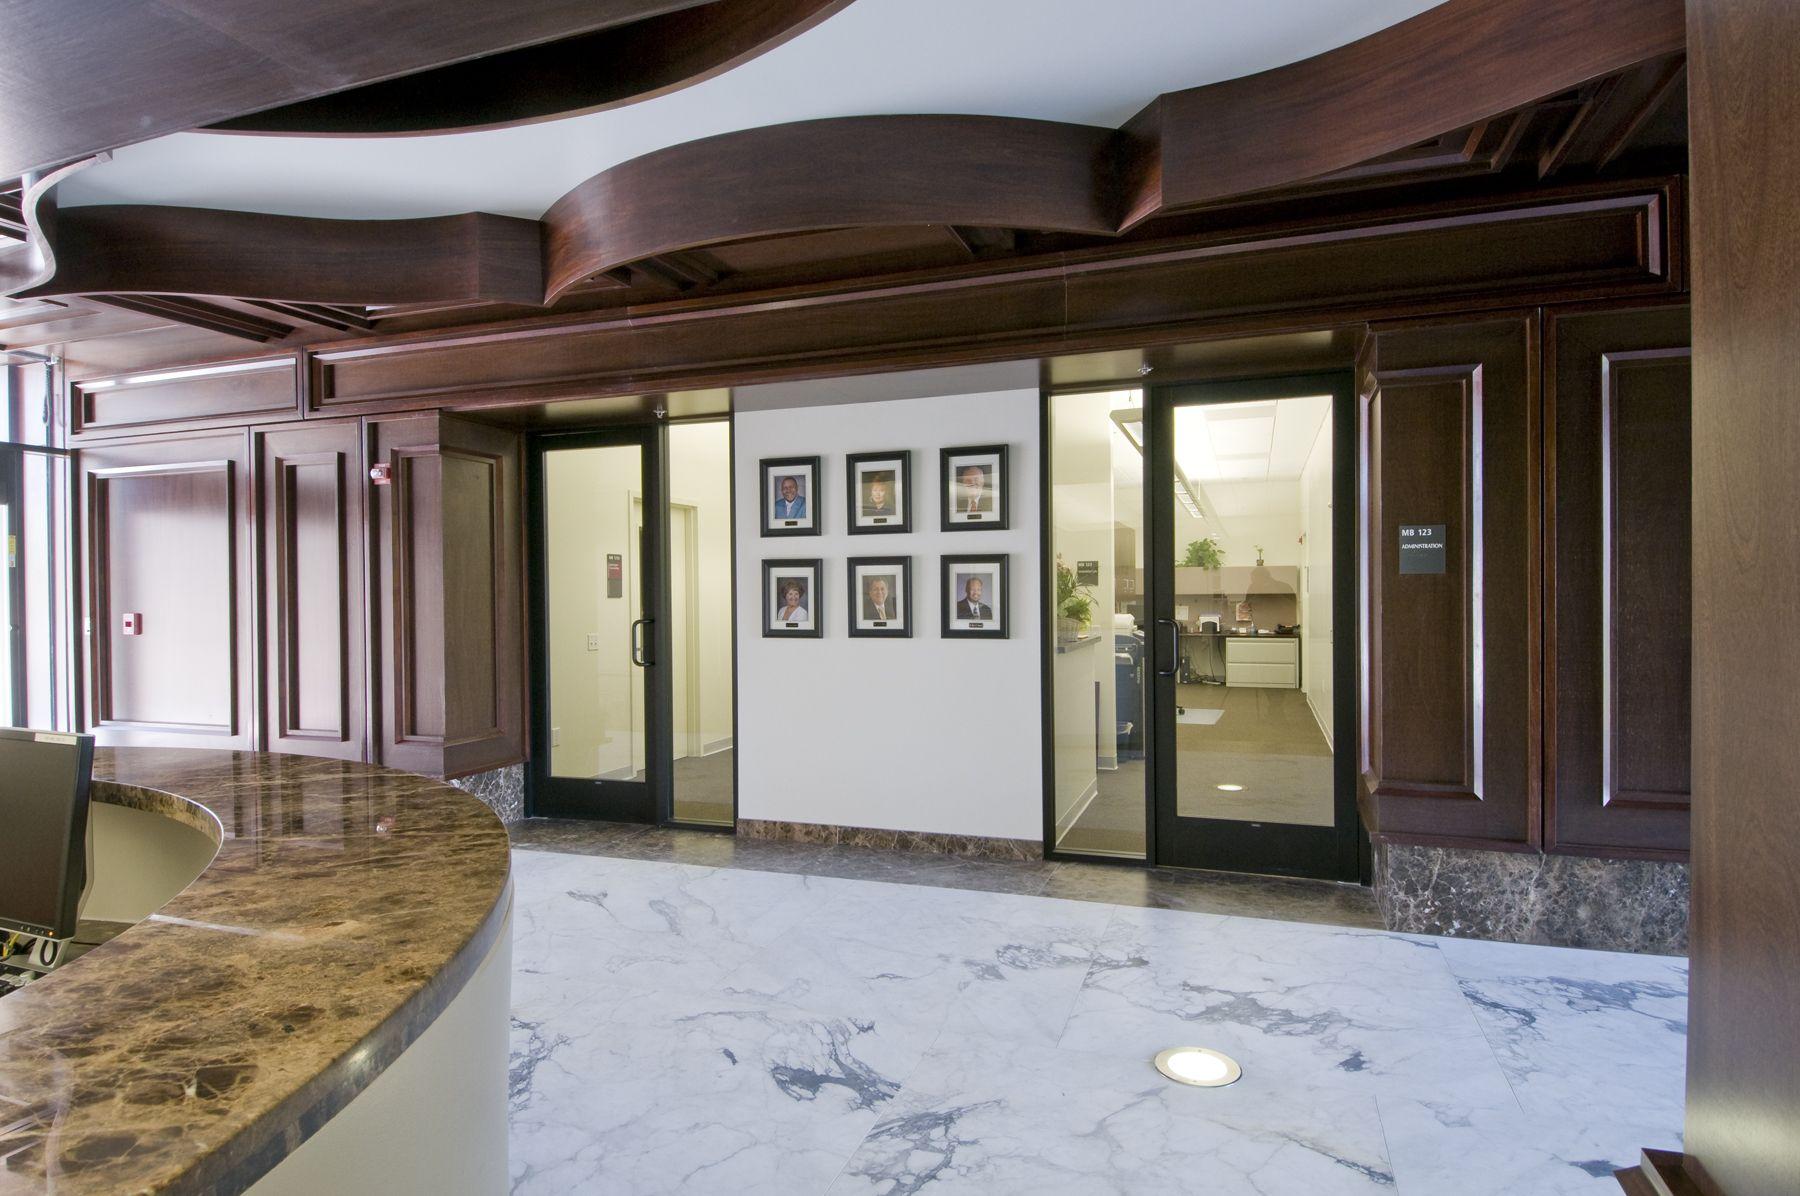 Main Lobby inside the Main Instructional Building at